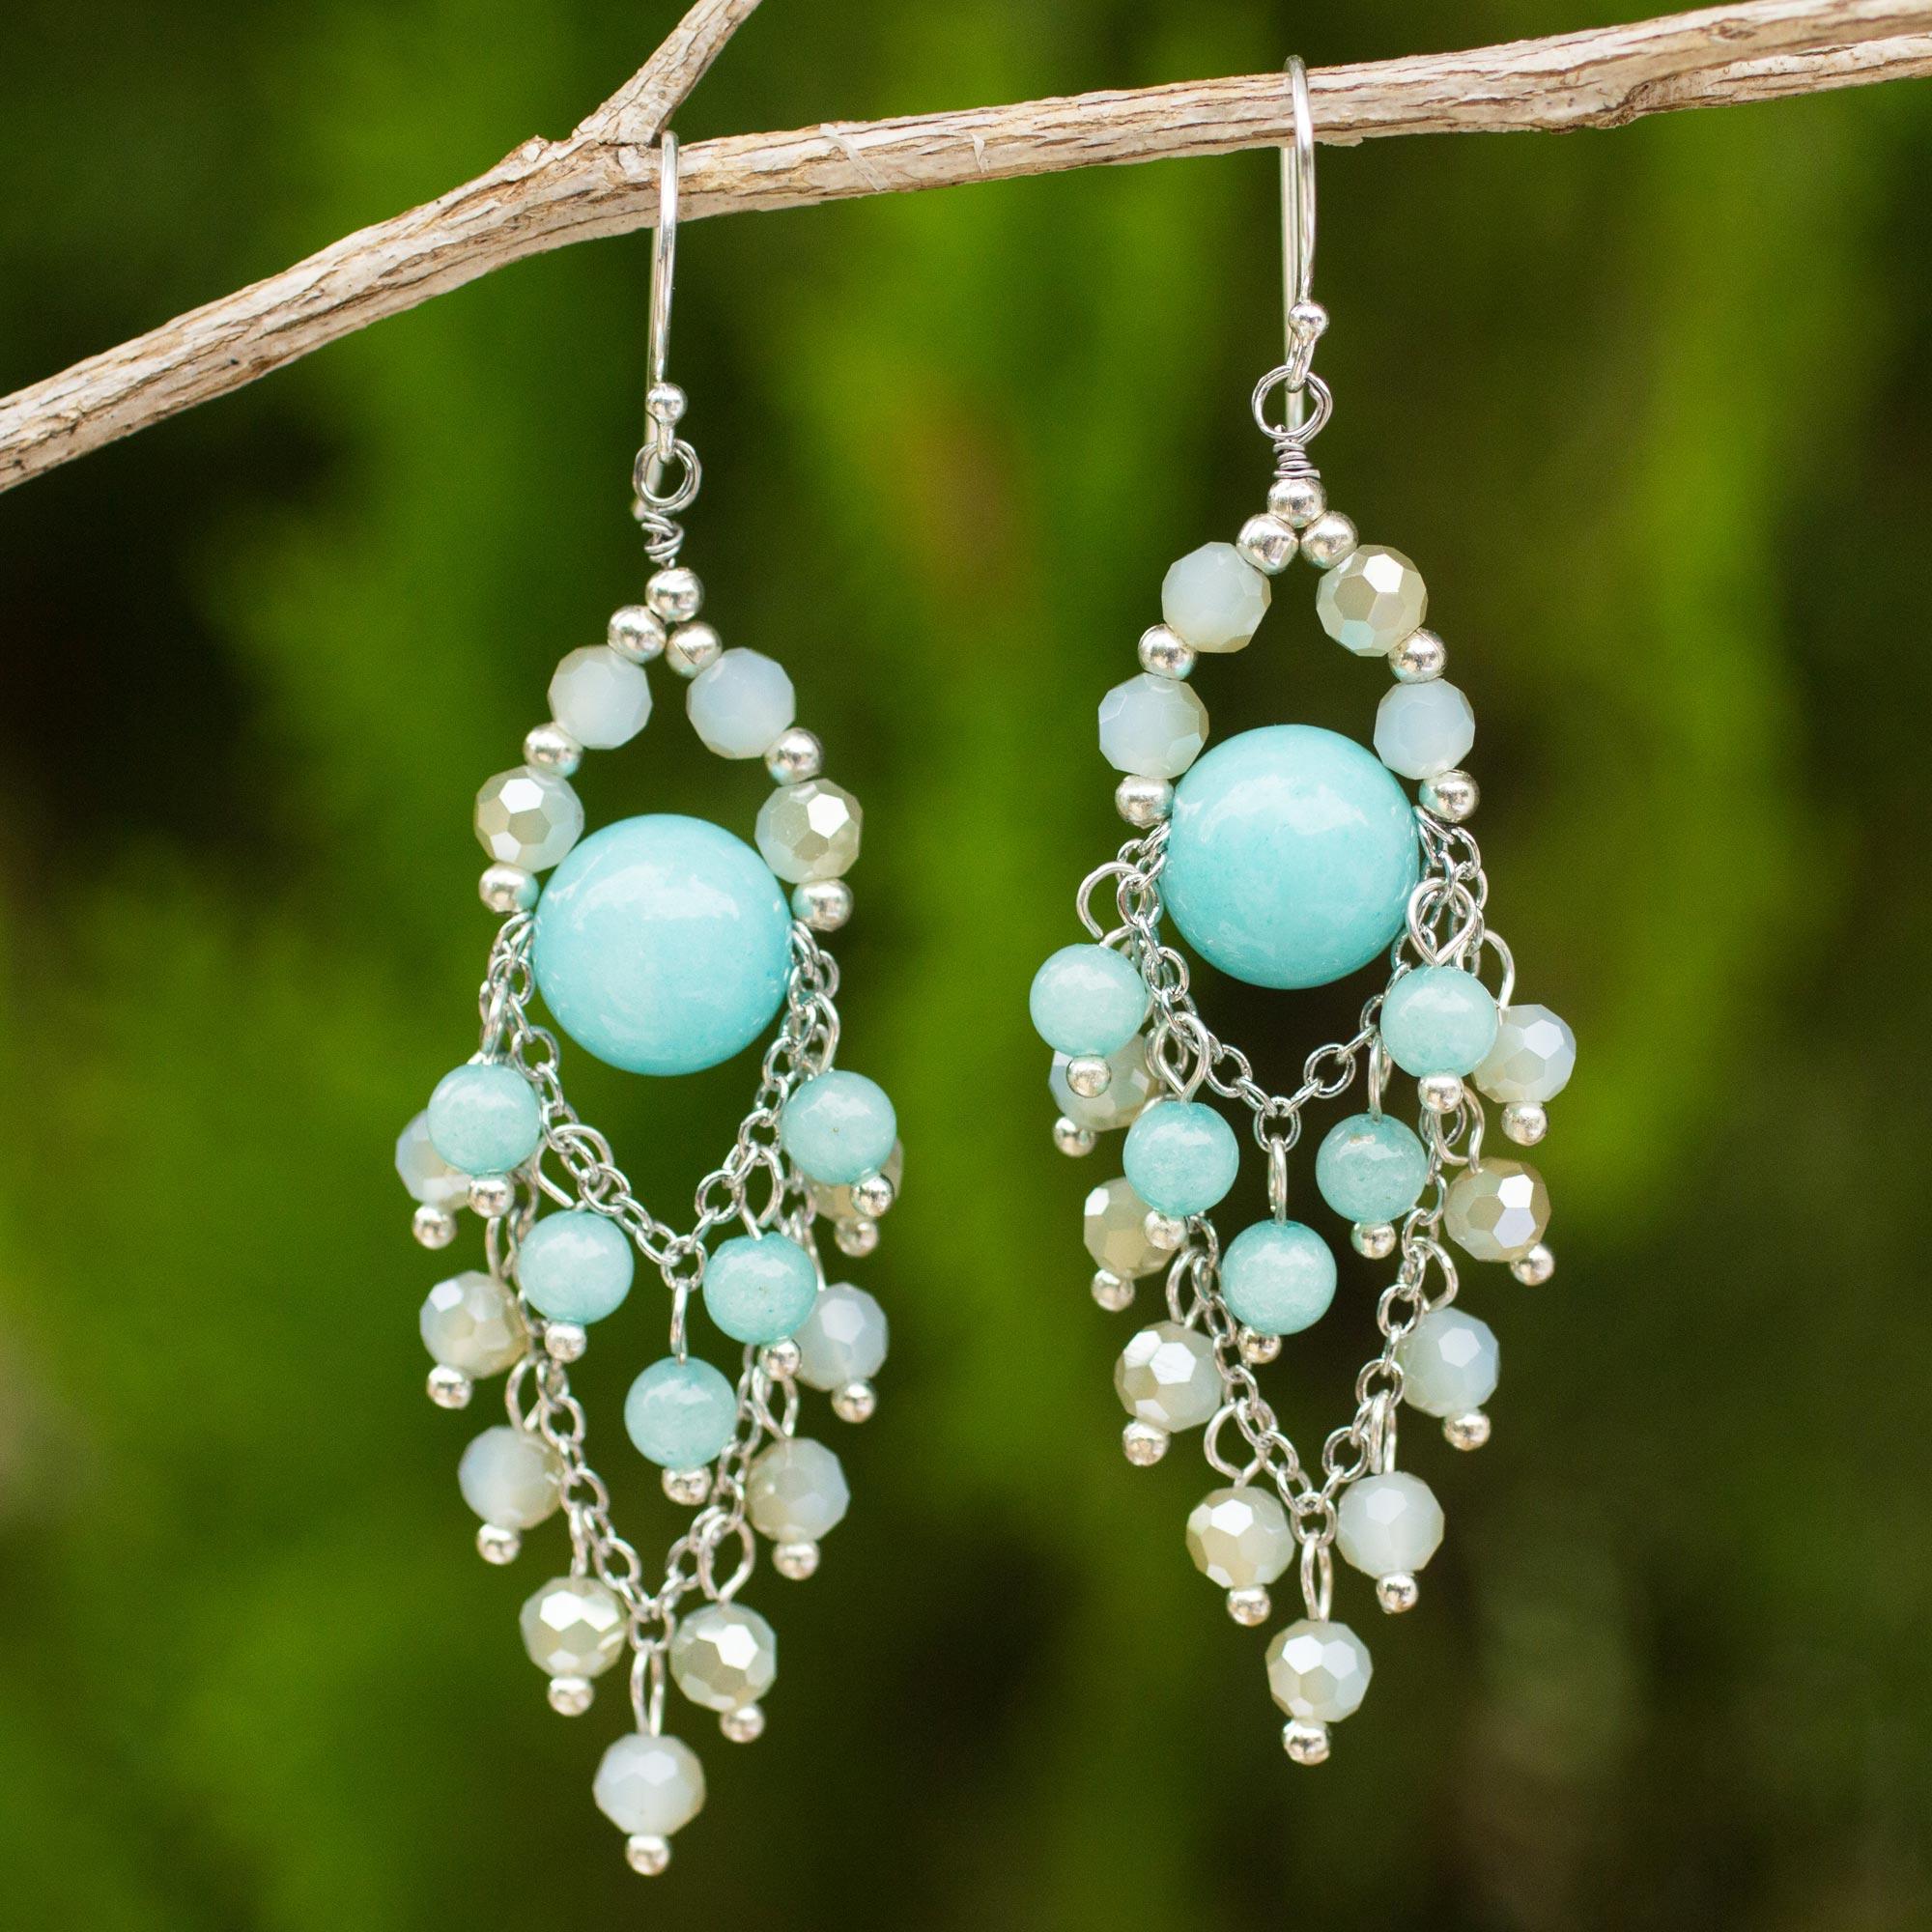 Turquoise Glass Beaded Chandelier Earrings